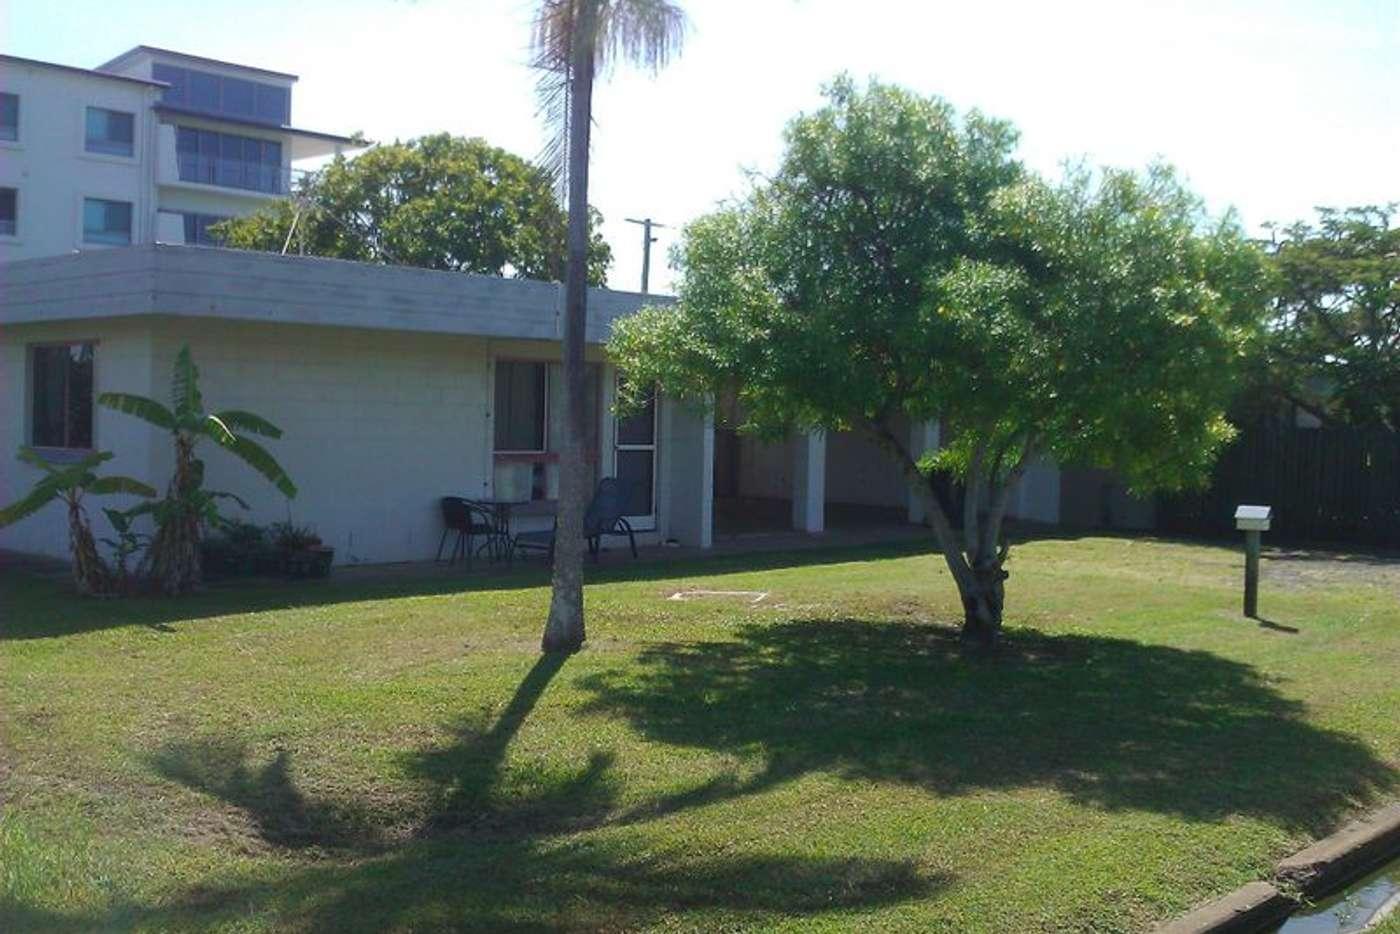 Main view of Homely unit listing, 3/7 McCavanagh Street, Bargara QLD 4670